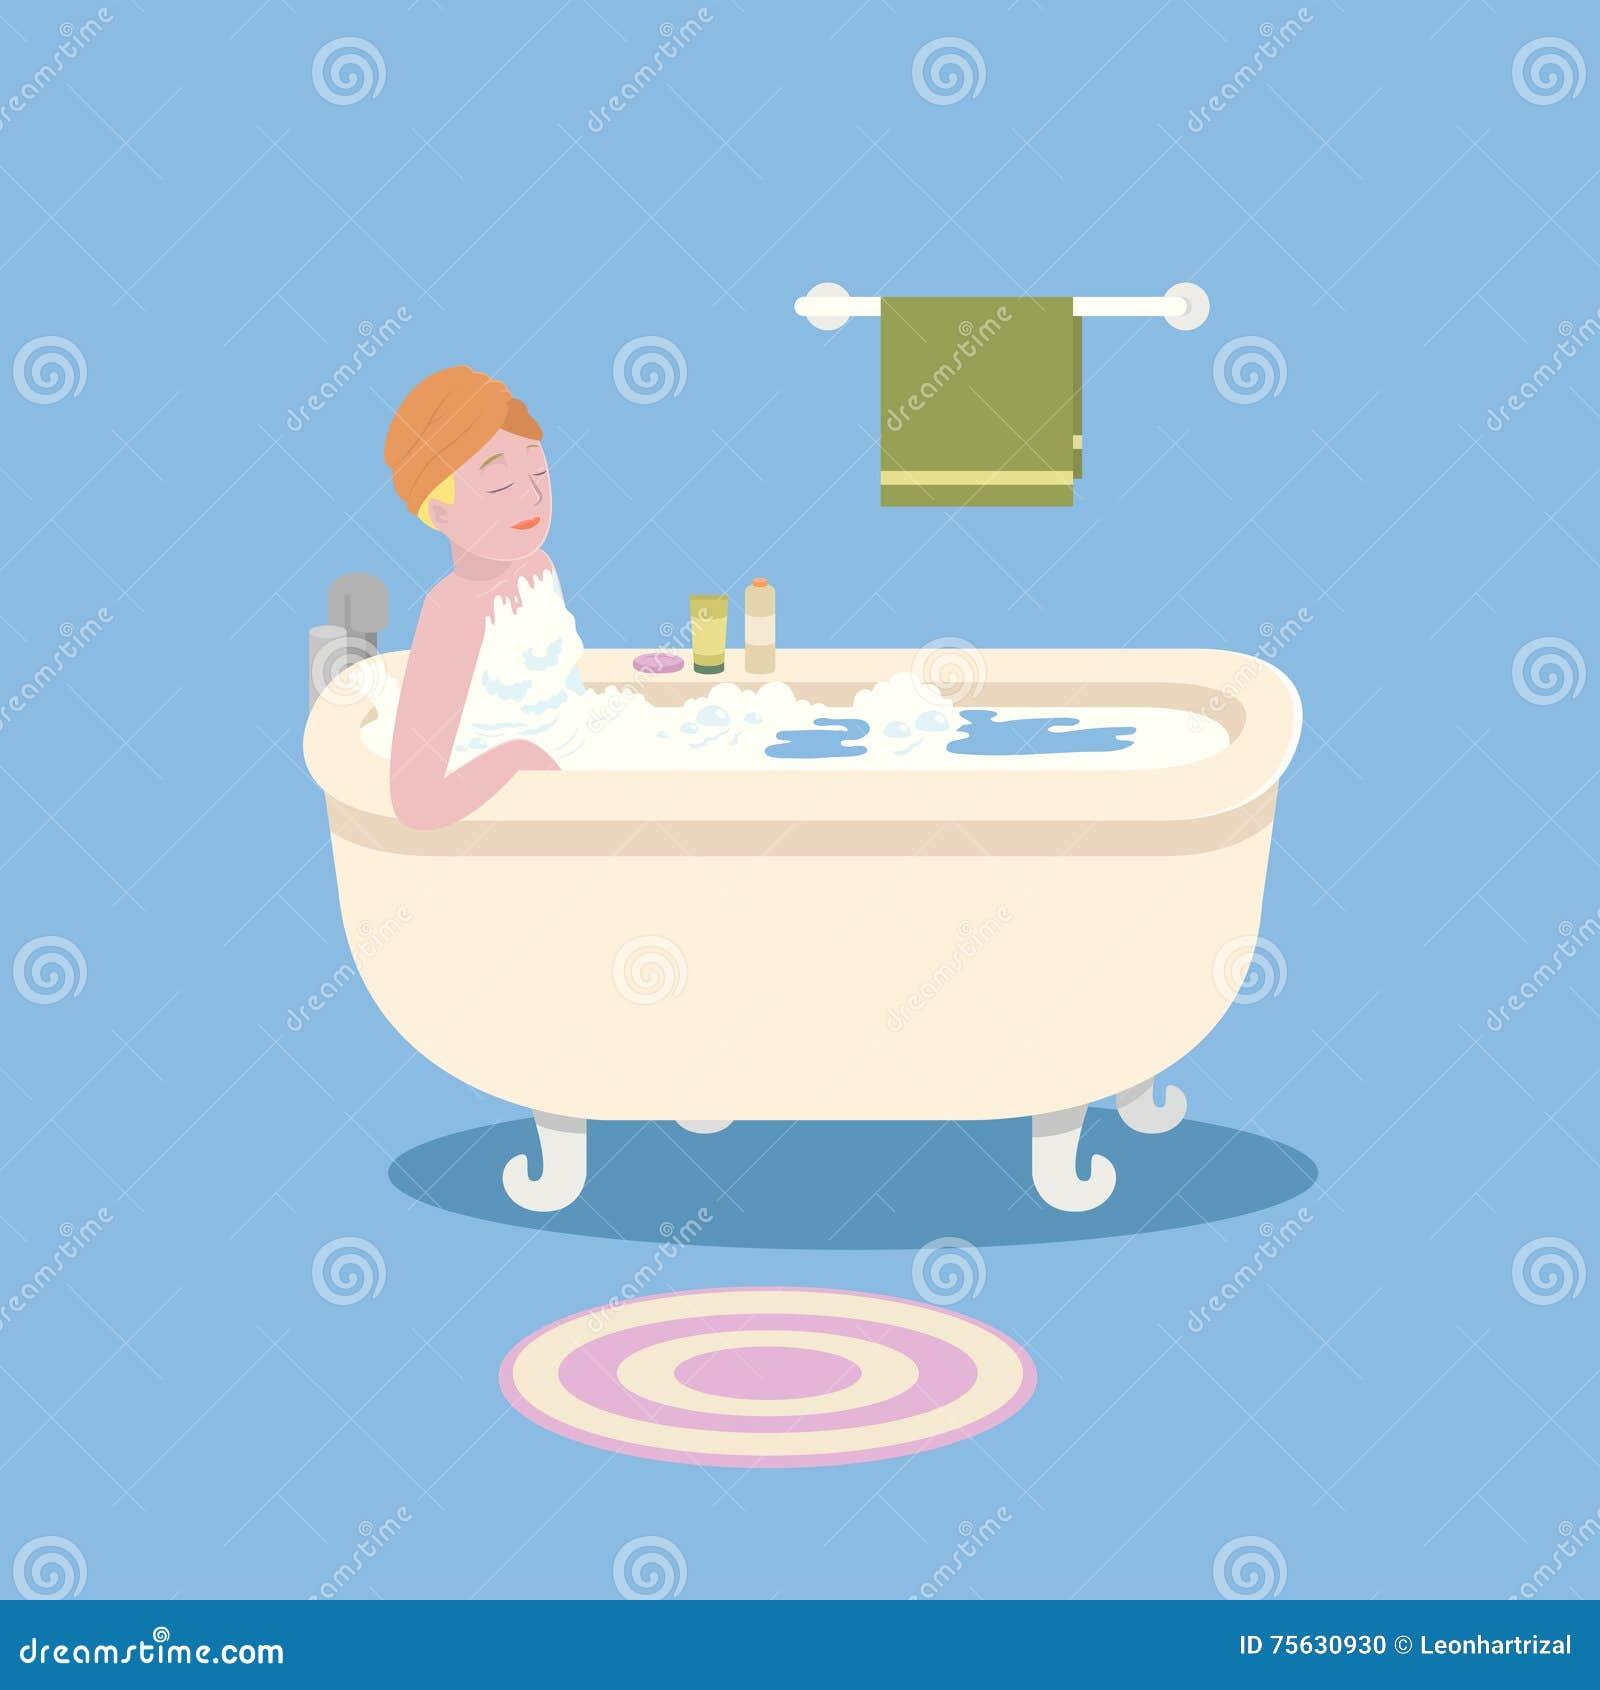 Woman in bathtub stock vector. Illustration of bath, conditioner ...